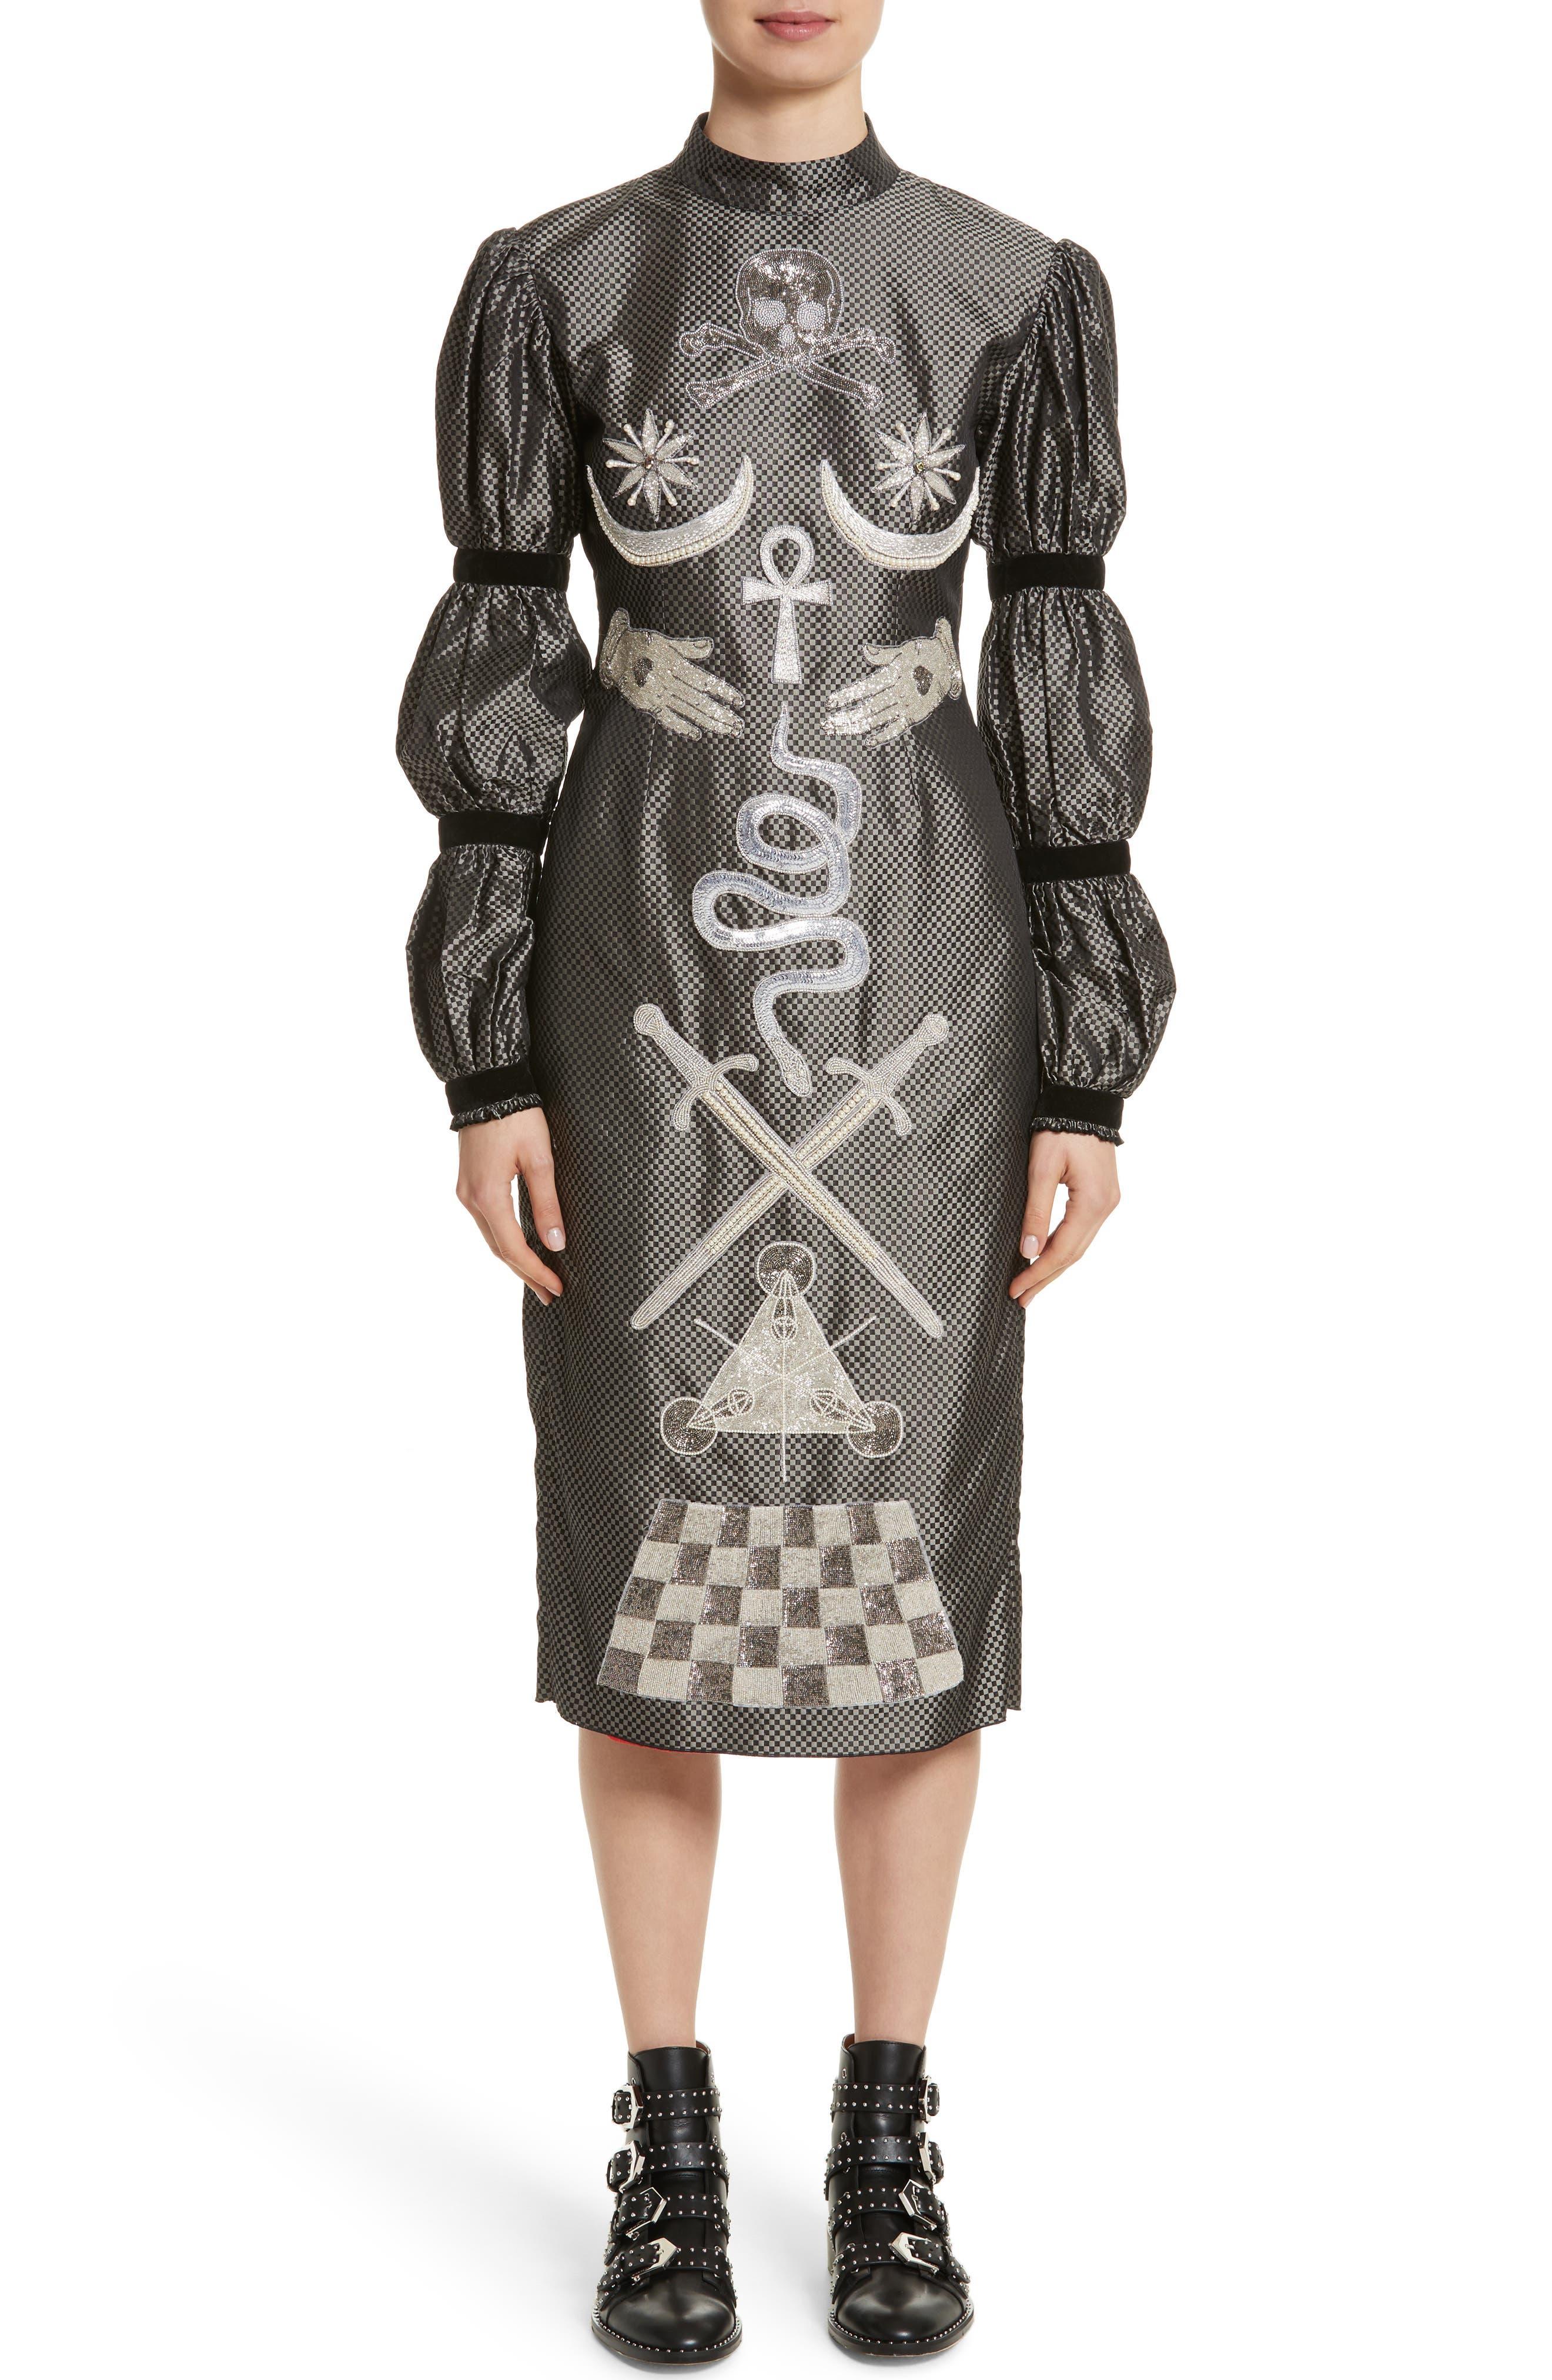 DILARA FINDIKOGLU Alien Goddess Embellished Silk Dress, Main, color, 040